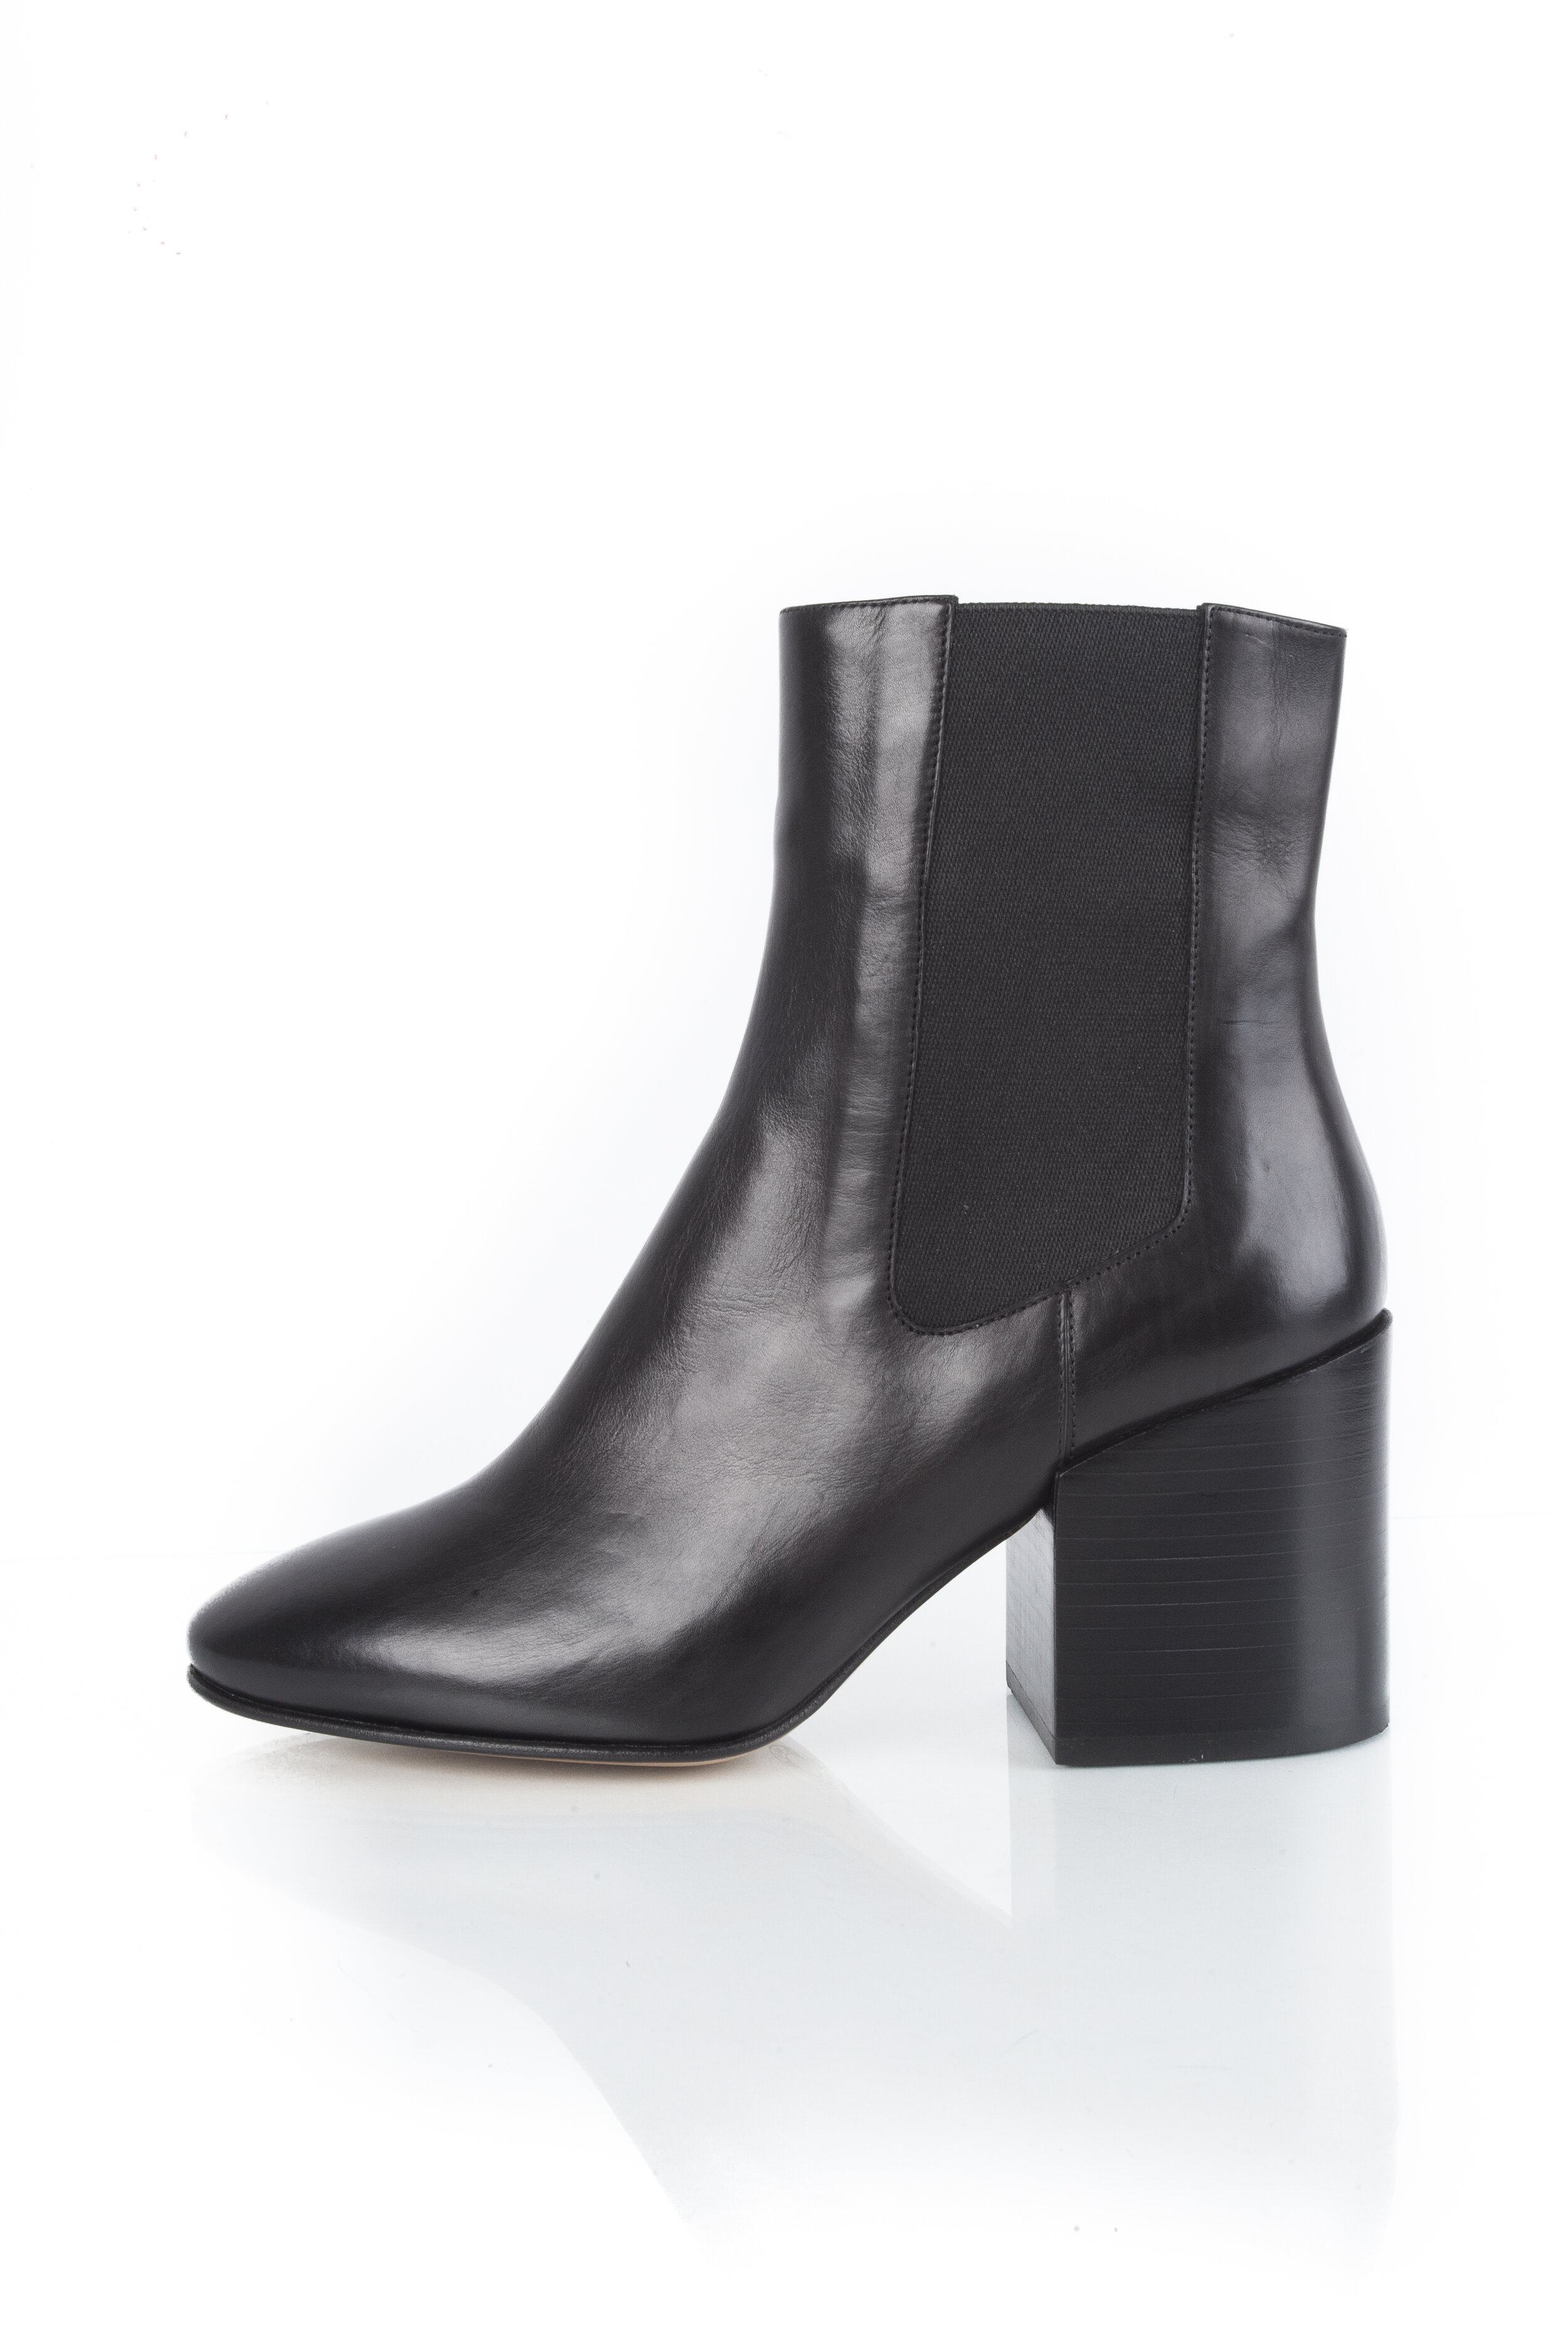 Dries Van Noten Ankle Boots — D A D